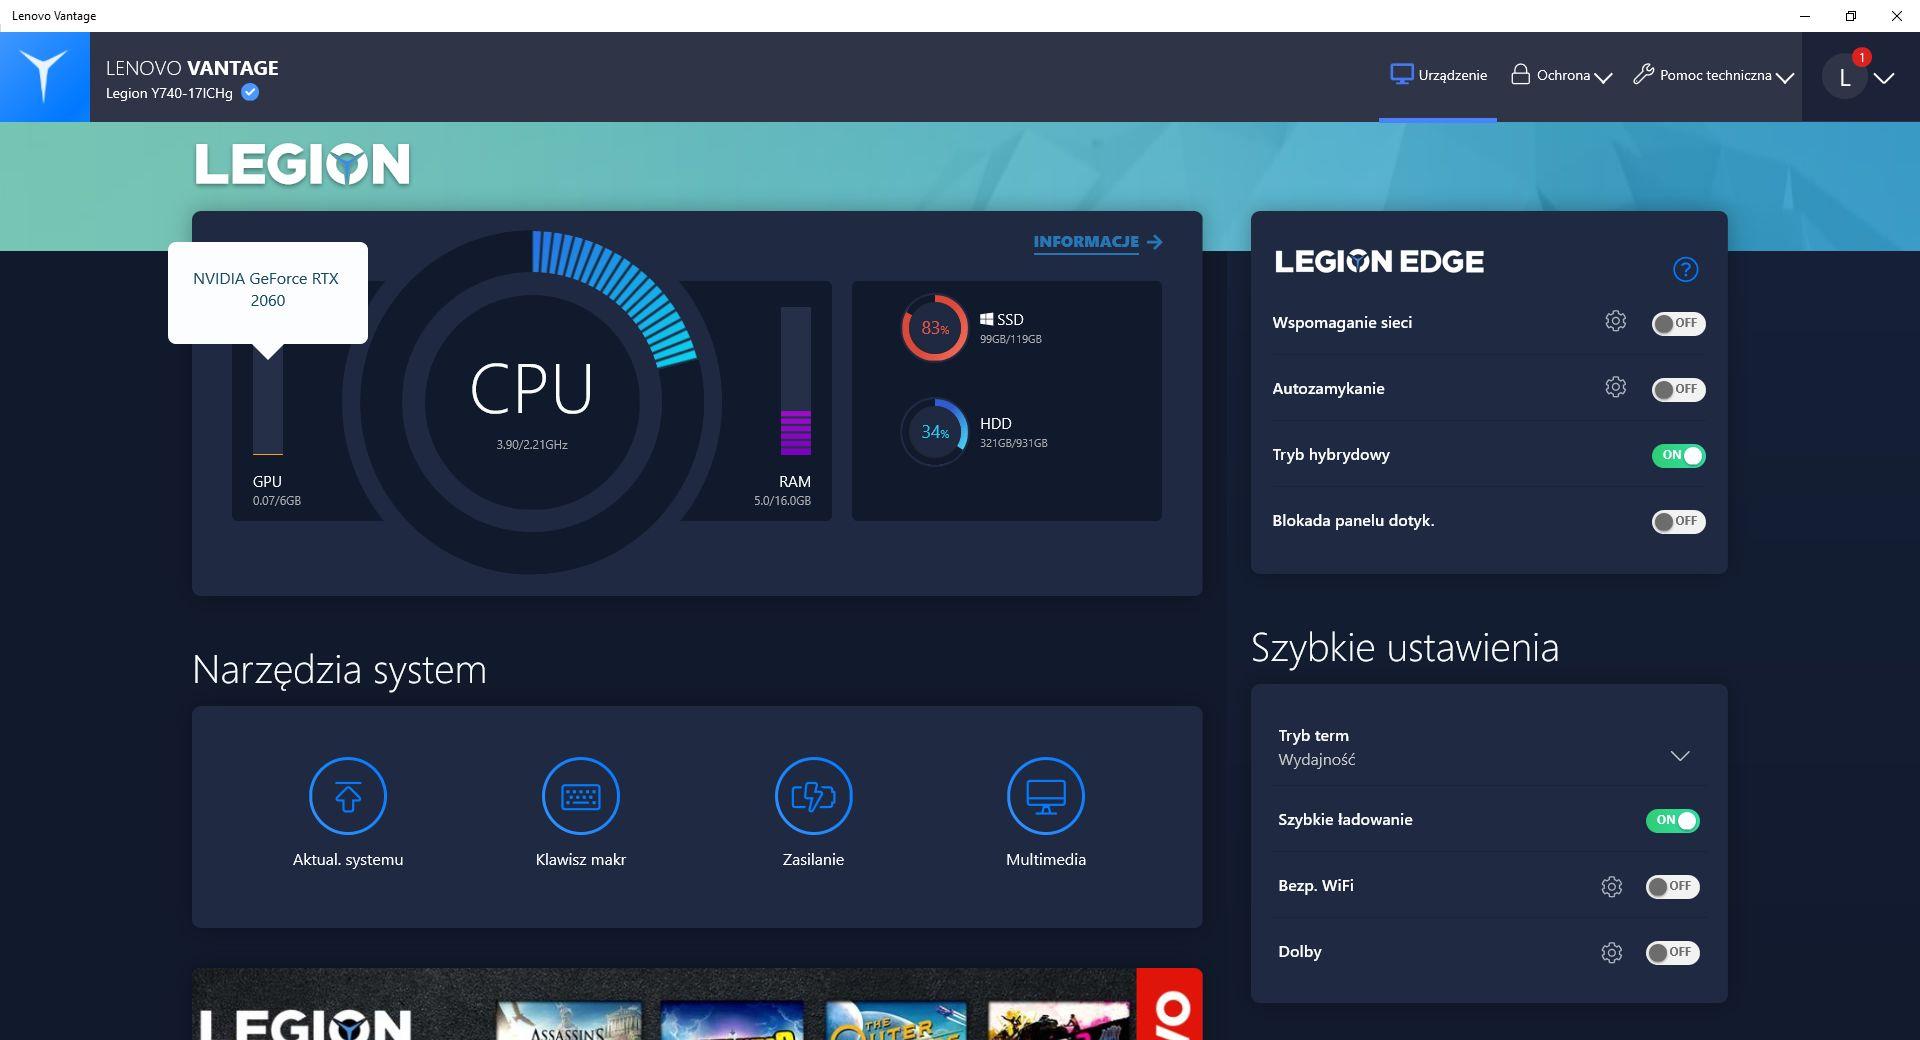 Lenovo_Vantage_15.06.2020_02_57_41_wynik